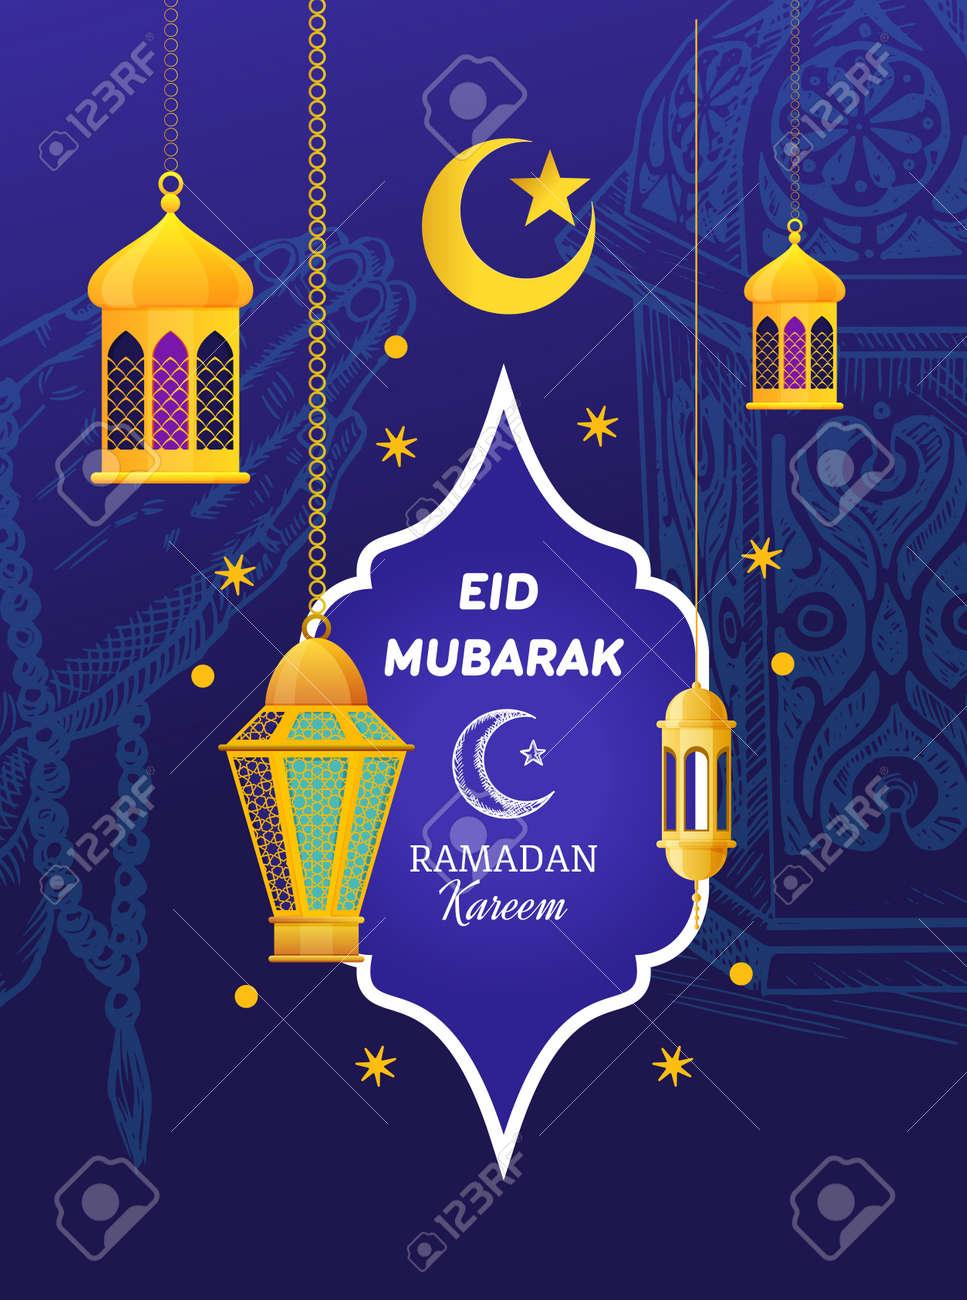 Eid Al Fitr Islamic Eid Mubarak Greeting Card Template I Royalty Free Cliparts Vectors And Stock Illustration Image 124575016